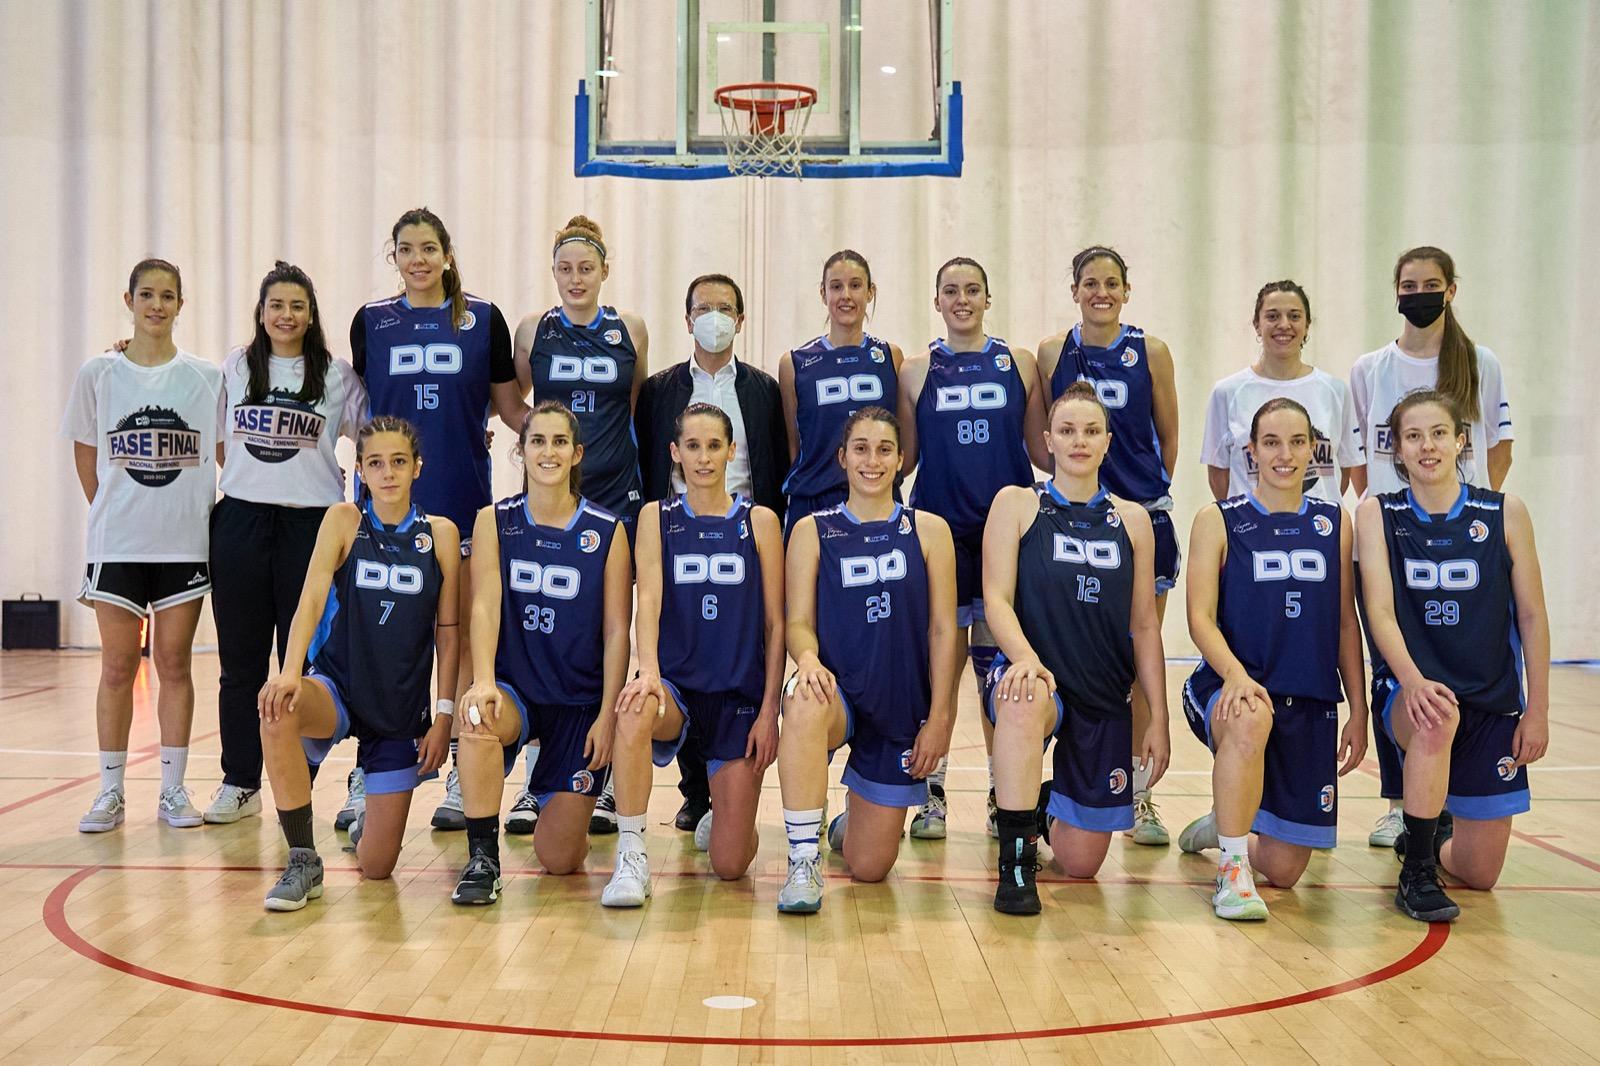 La tinerfeña Daira Varas asciende a Liga Femenina 2 con Distrito Olímpico